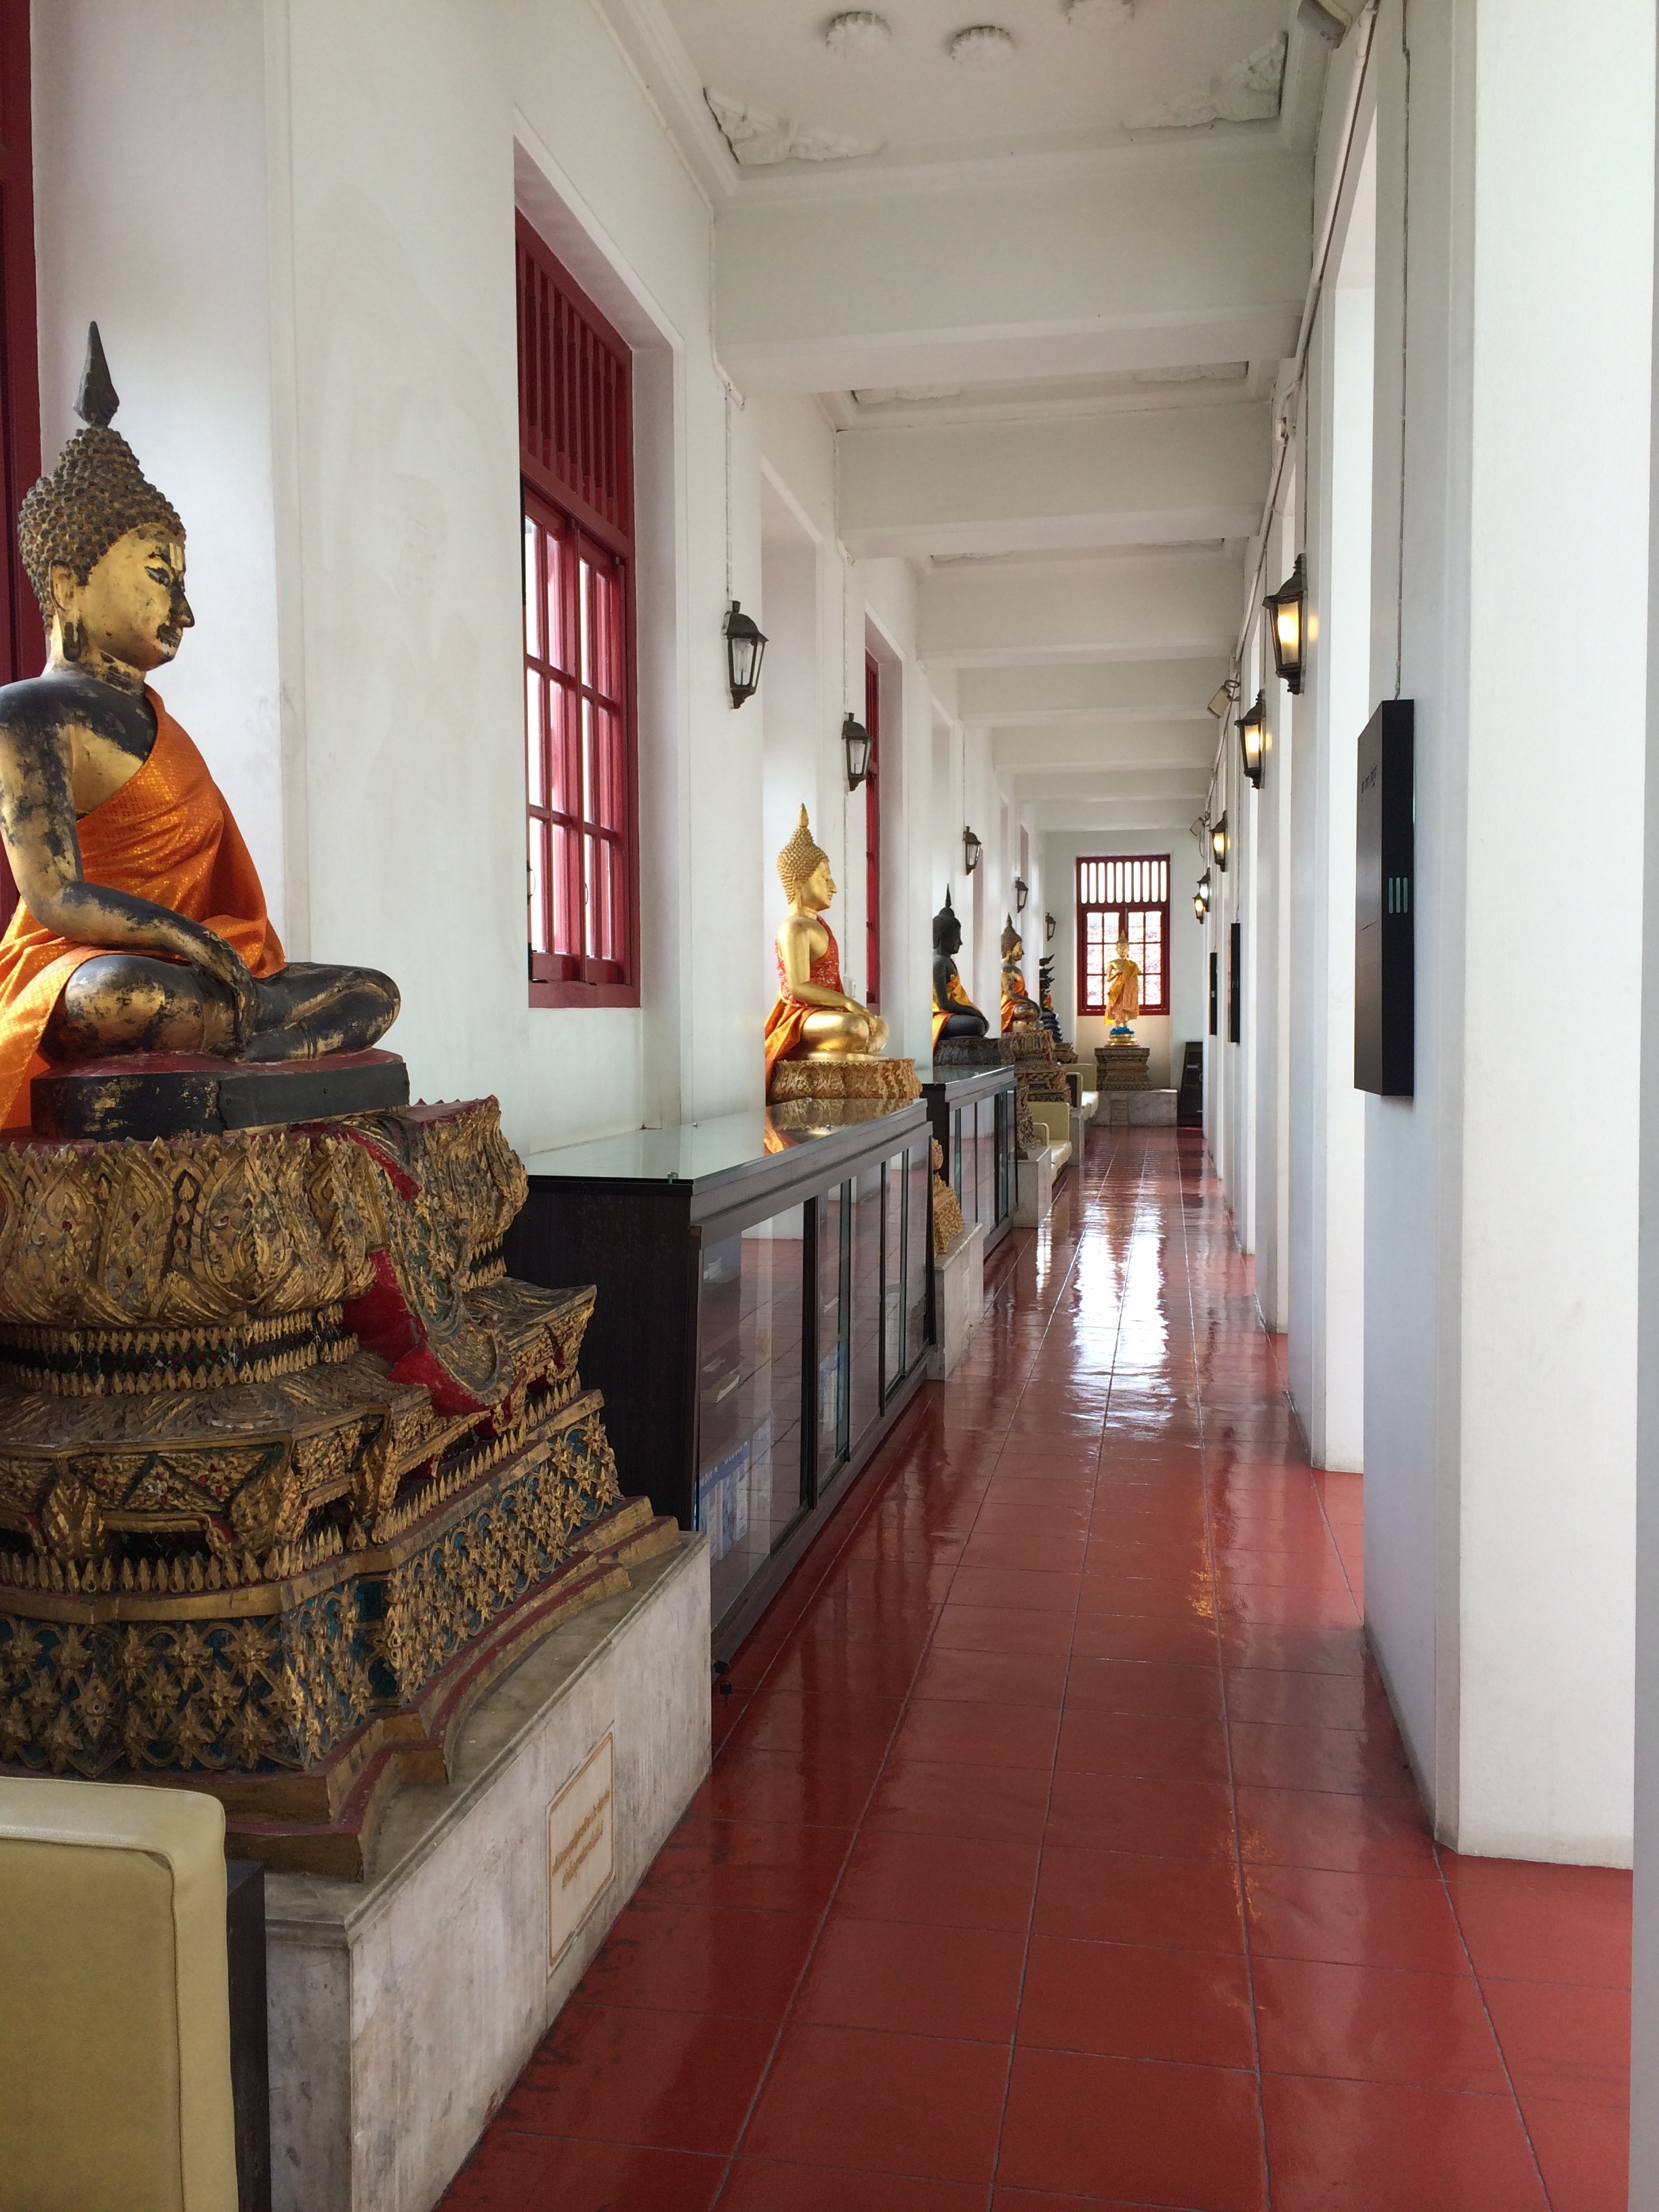 Buddhas in Bangkok, Thailand Temple